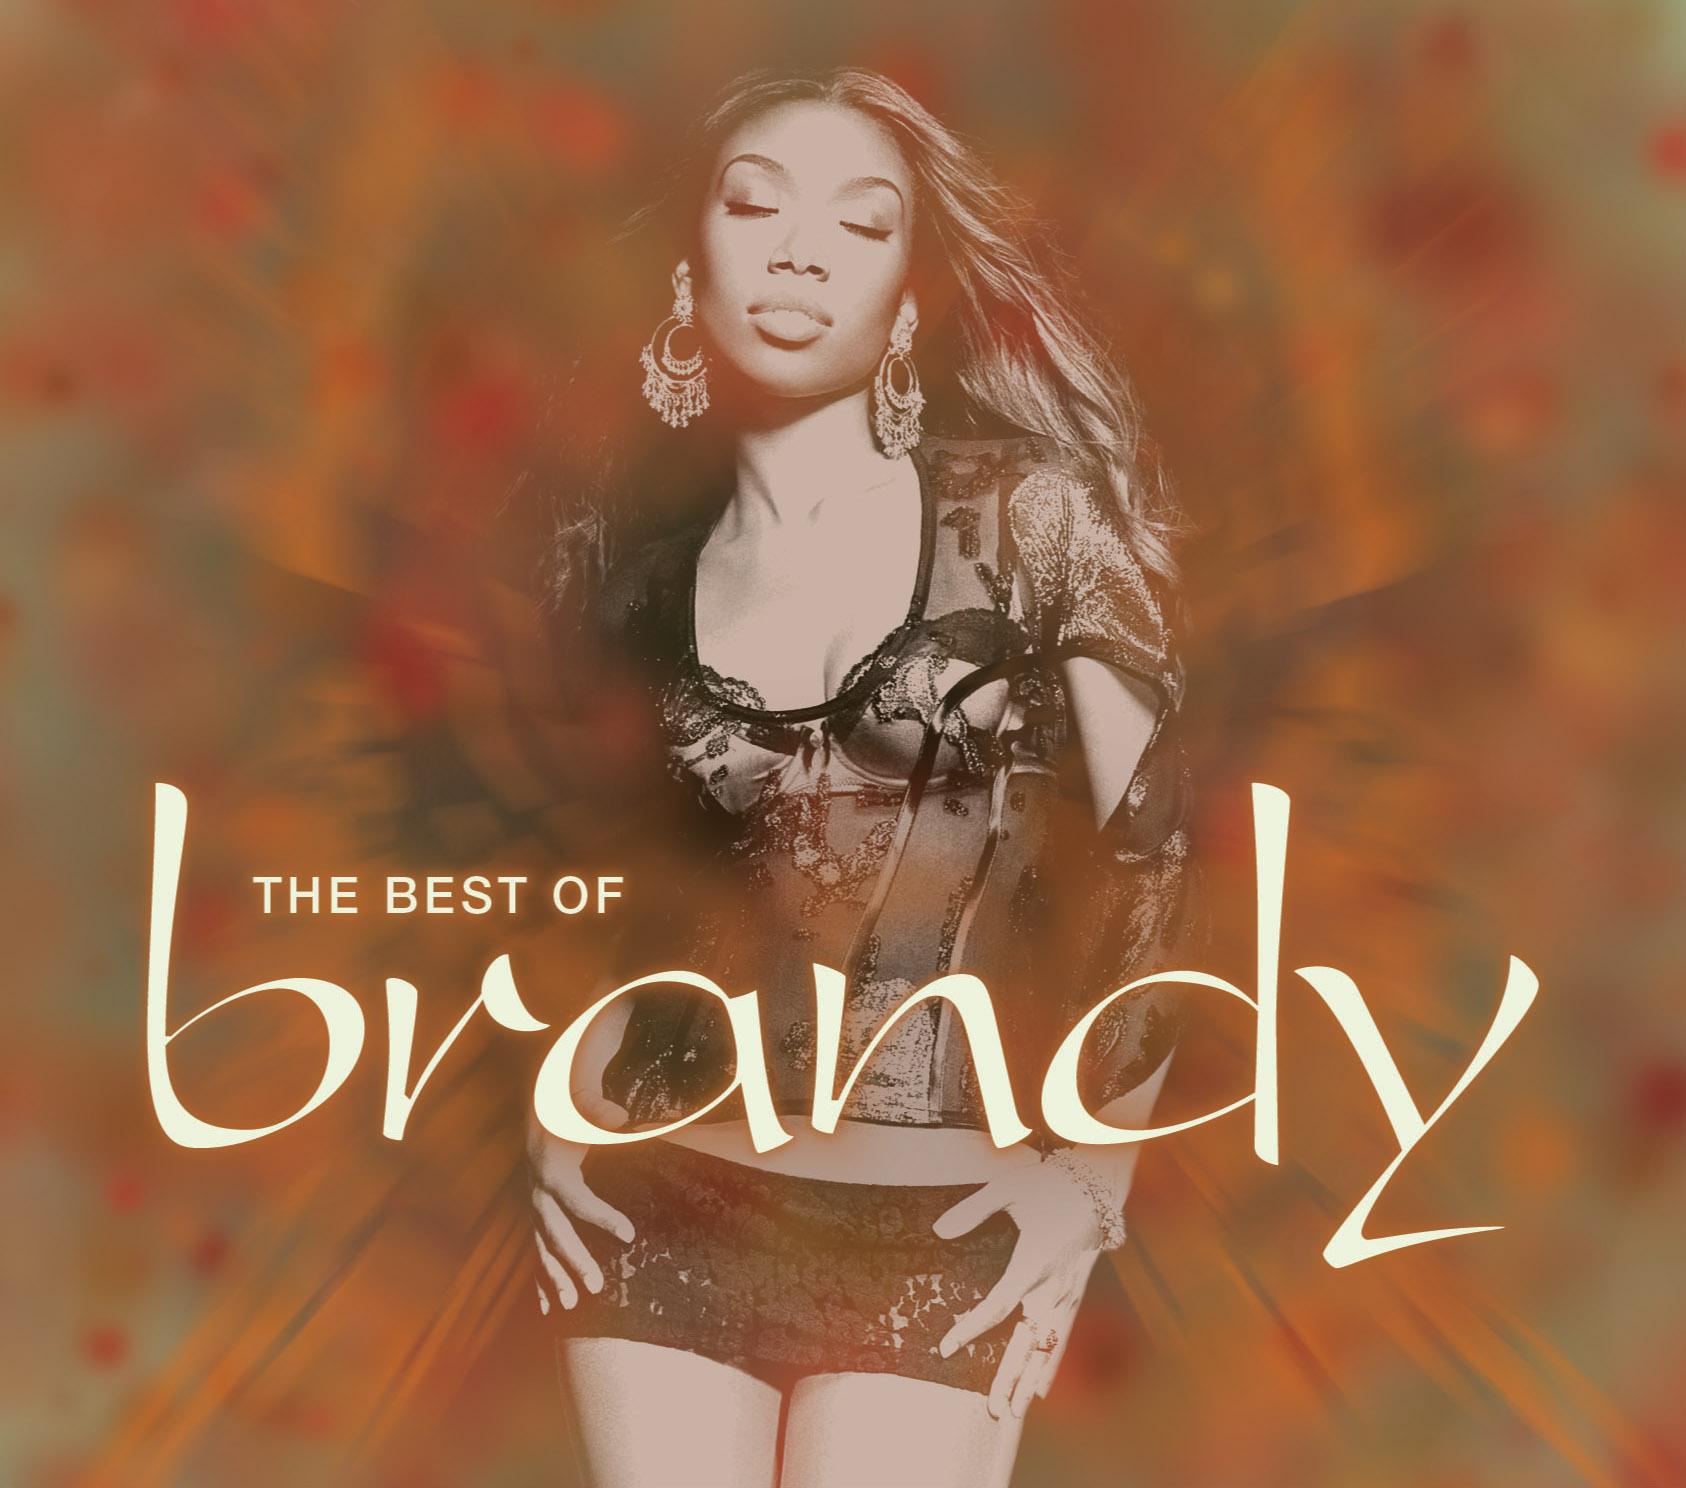 Brandy Best Of cover 74647.jpg